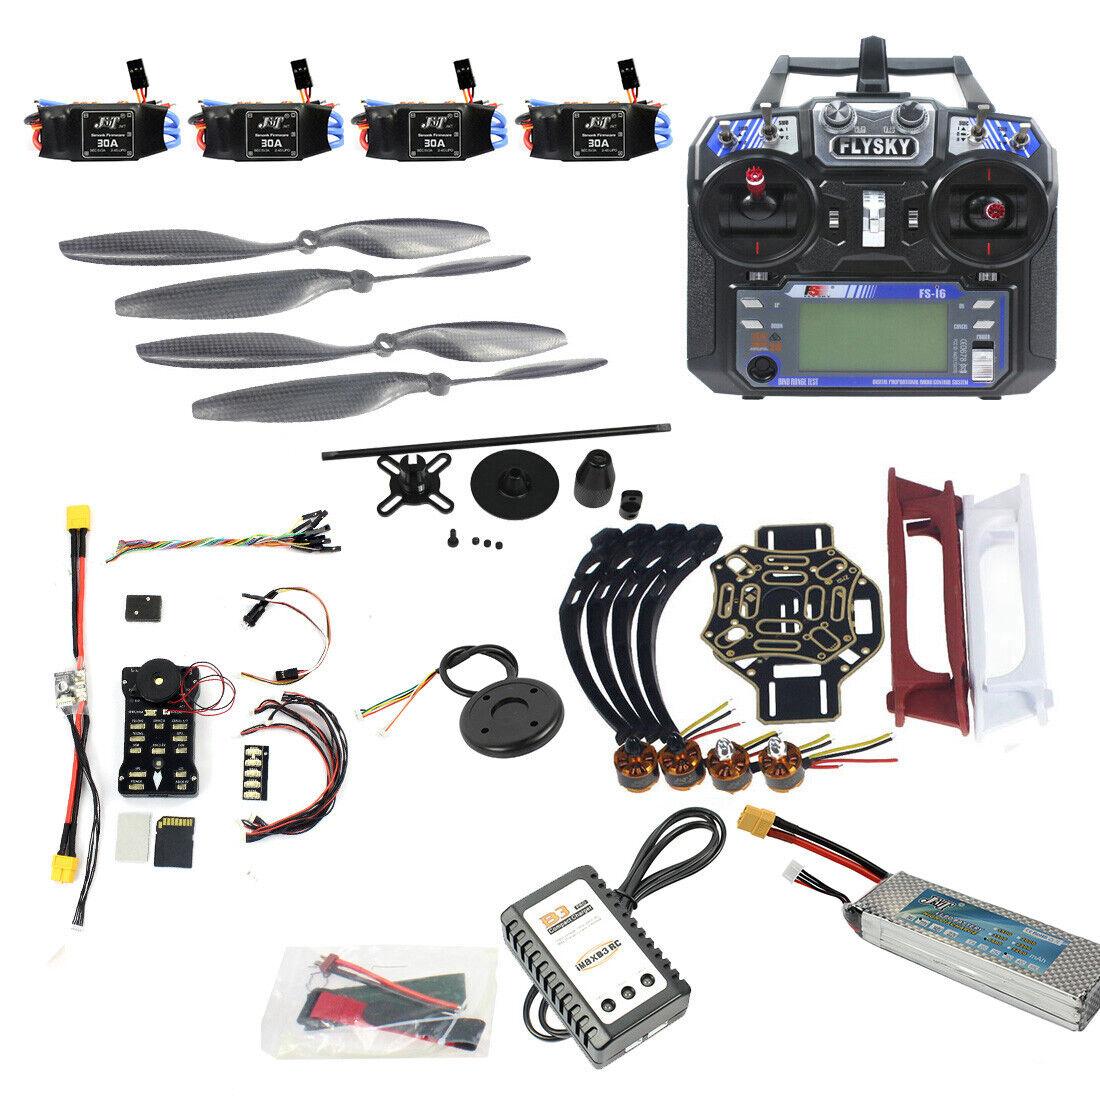 Conjunto COMPLETO hágalo usted mismo FPV DRONE CUADRICÓPTERO 450 aviones Kit cuadro PXI PX4 control de vuelo